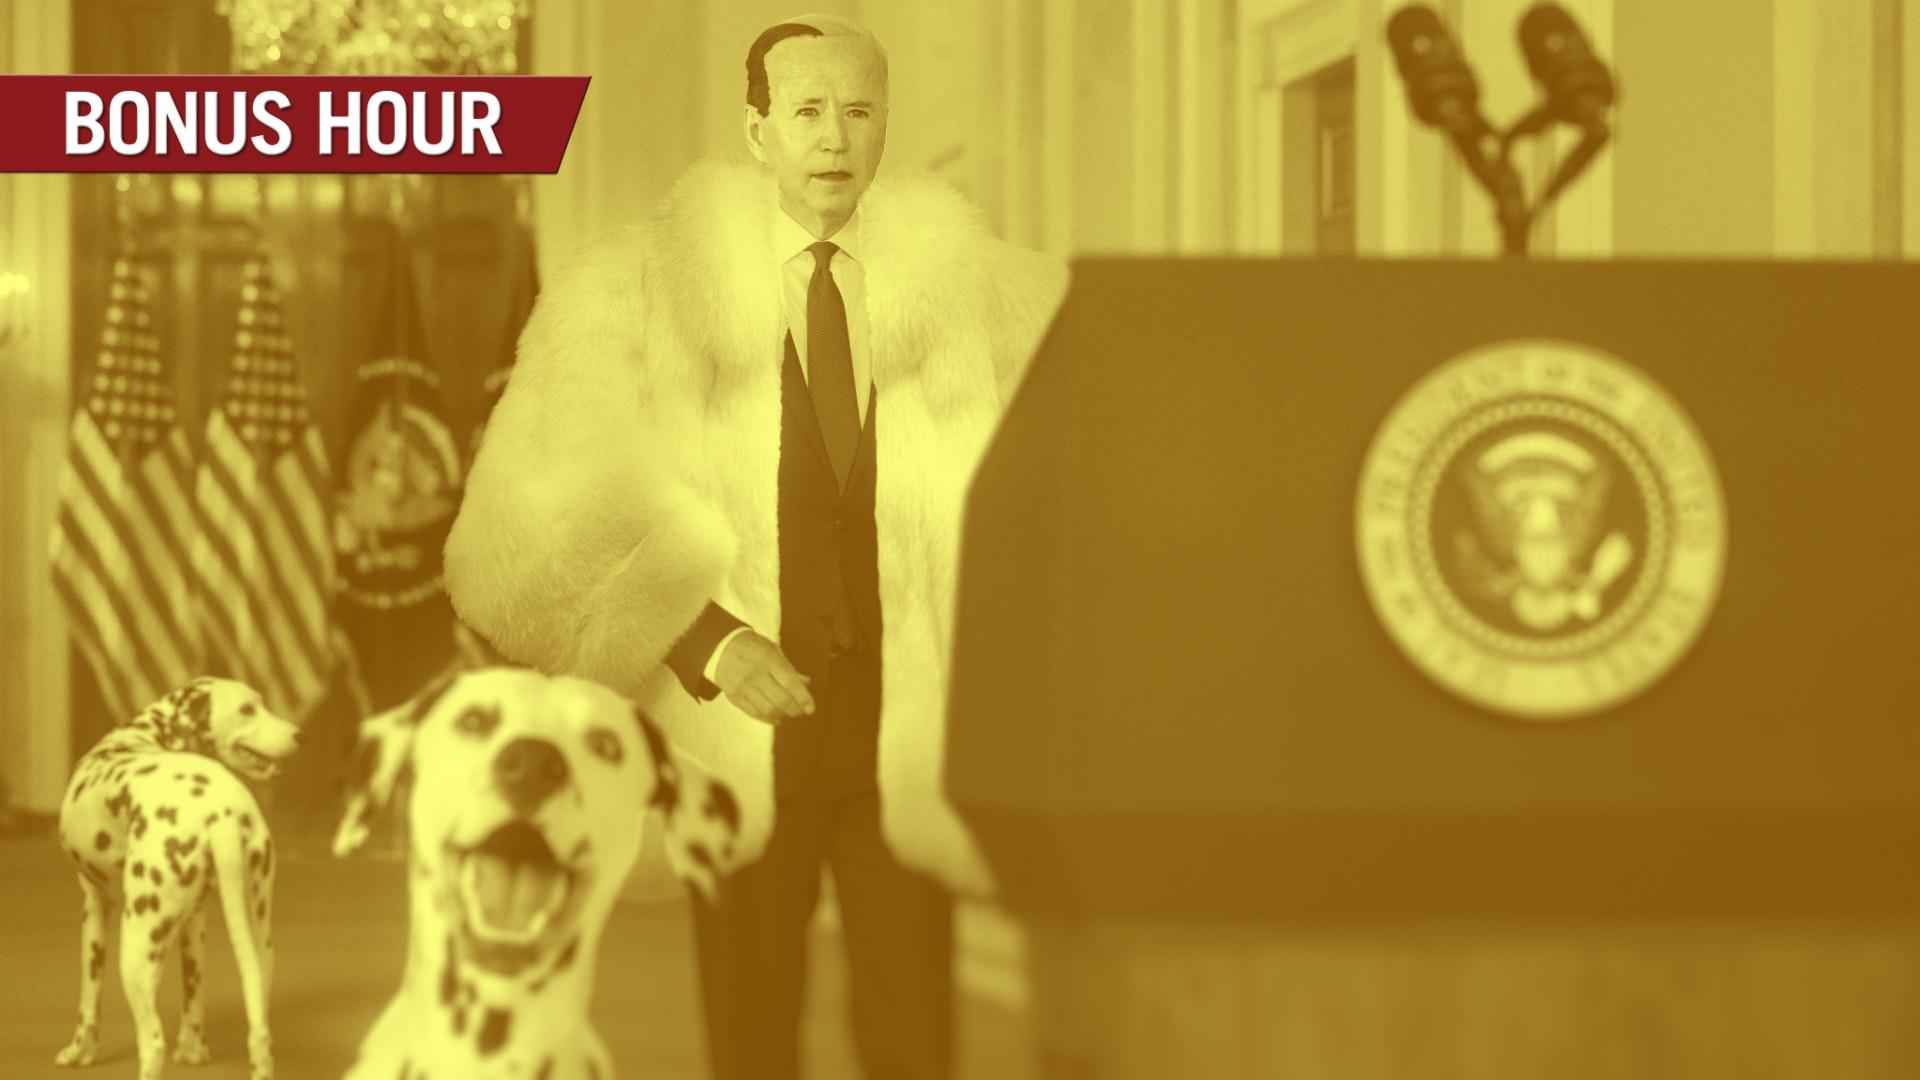 Ep. 1331 - For Joe Biden, The Cruelty Is The Point [Bonus Hour]